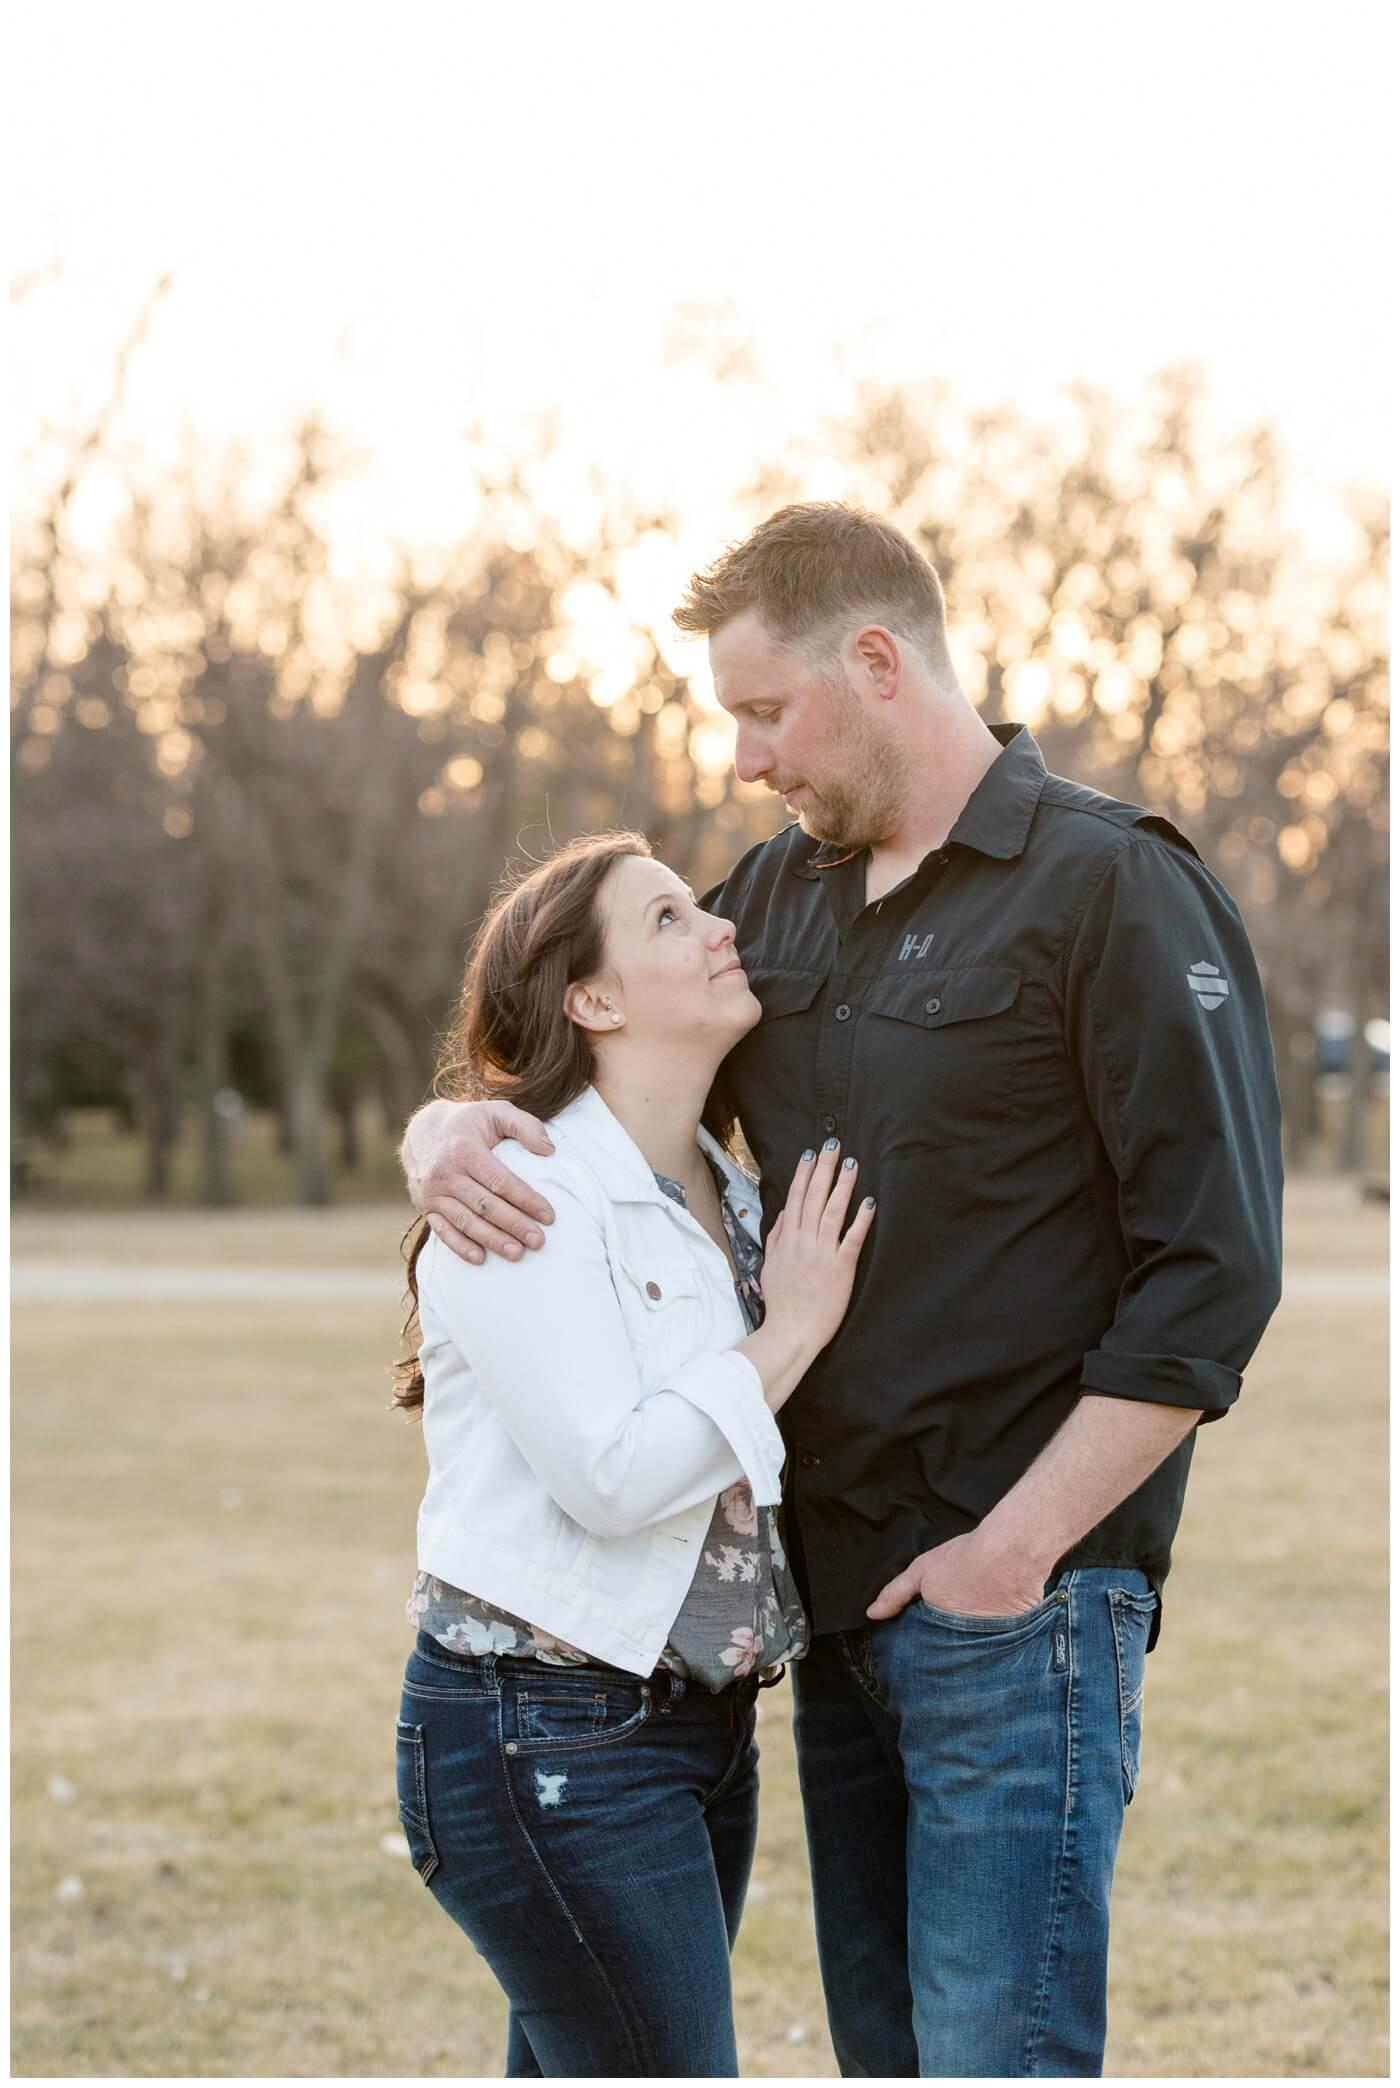 Travis & Coralynn Regina Engagement Session- Wascana Park engagement session at sunset